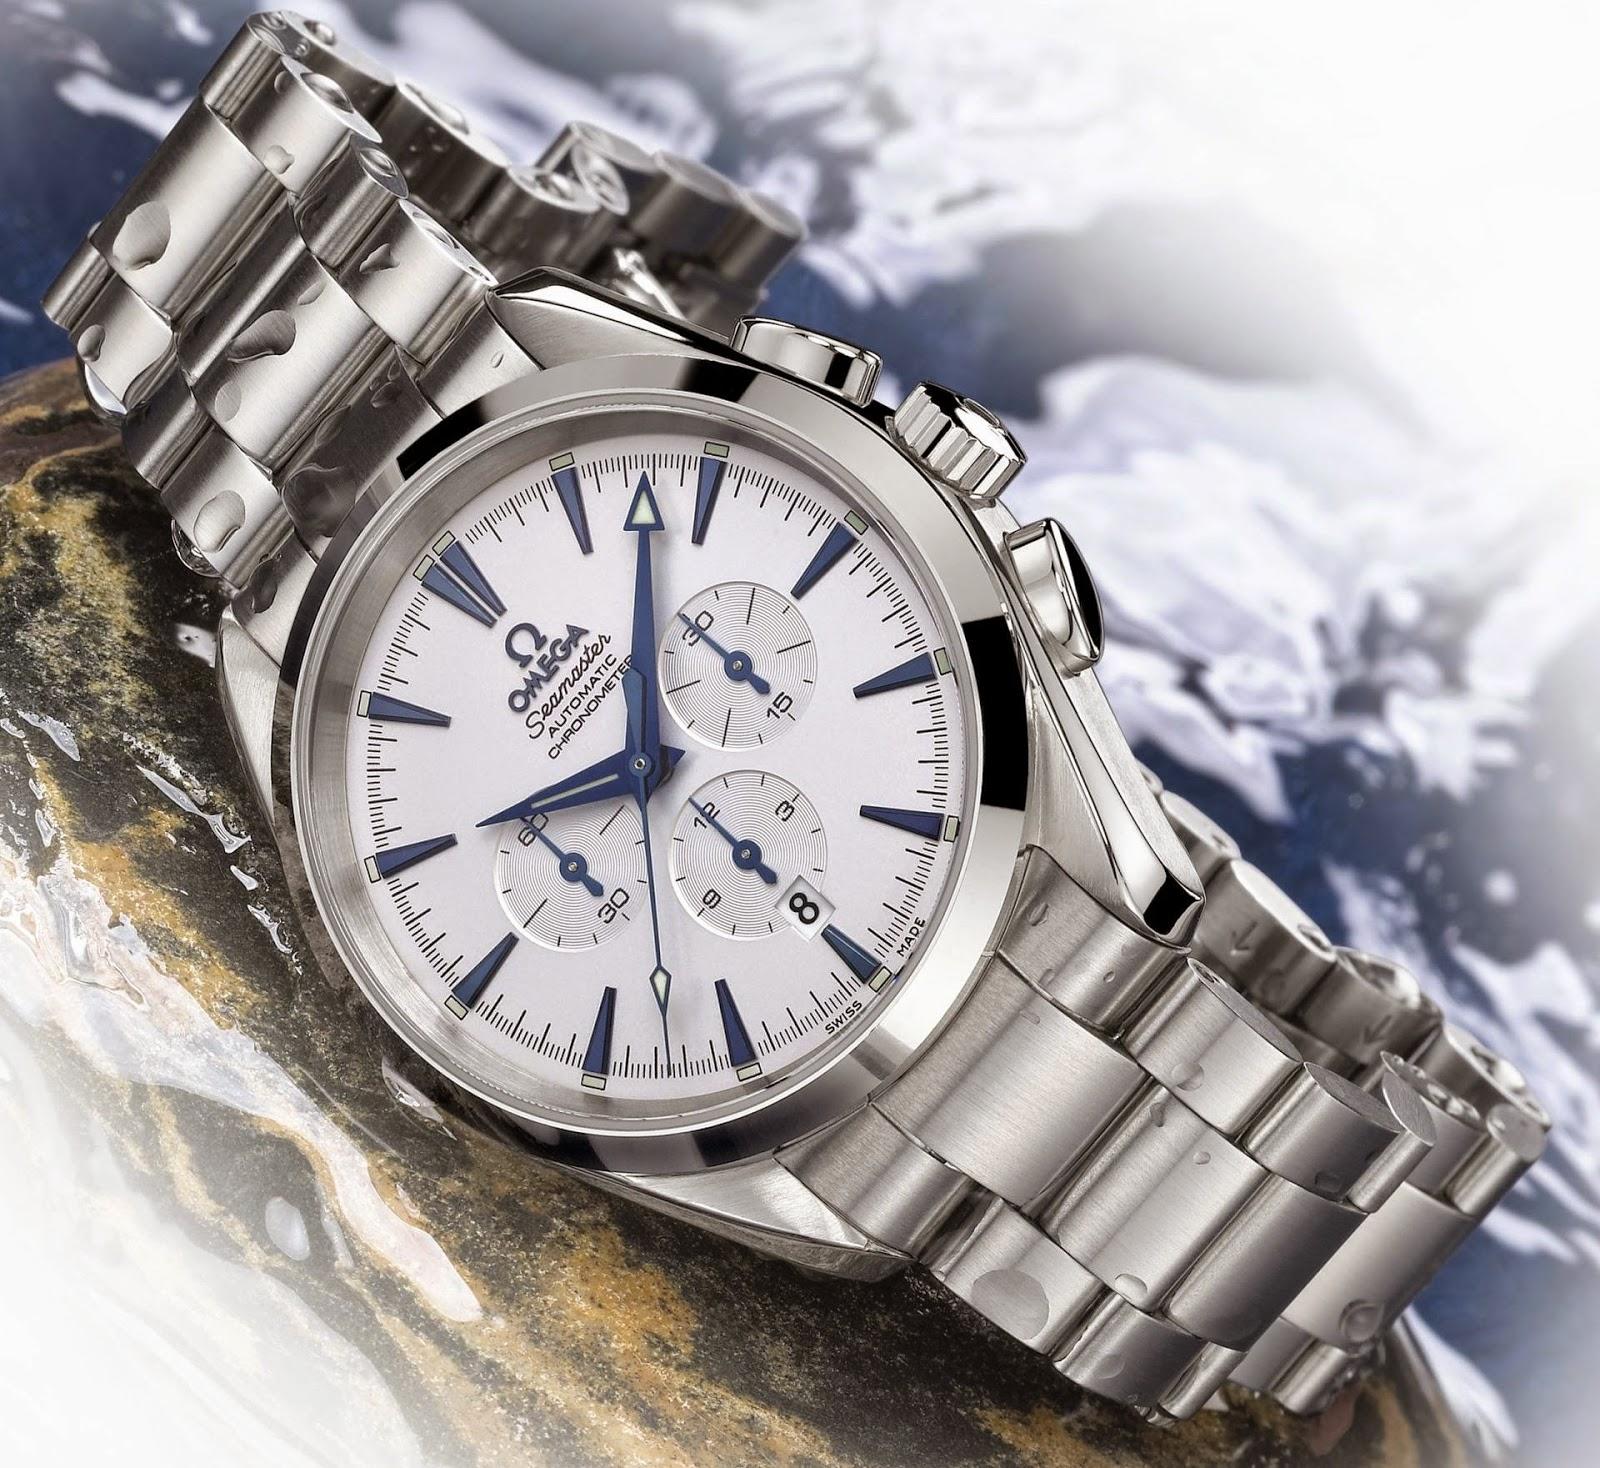 Omega Seamaster Aqua Terra Chronograph with stainless steel bracelet